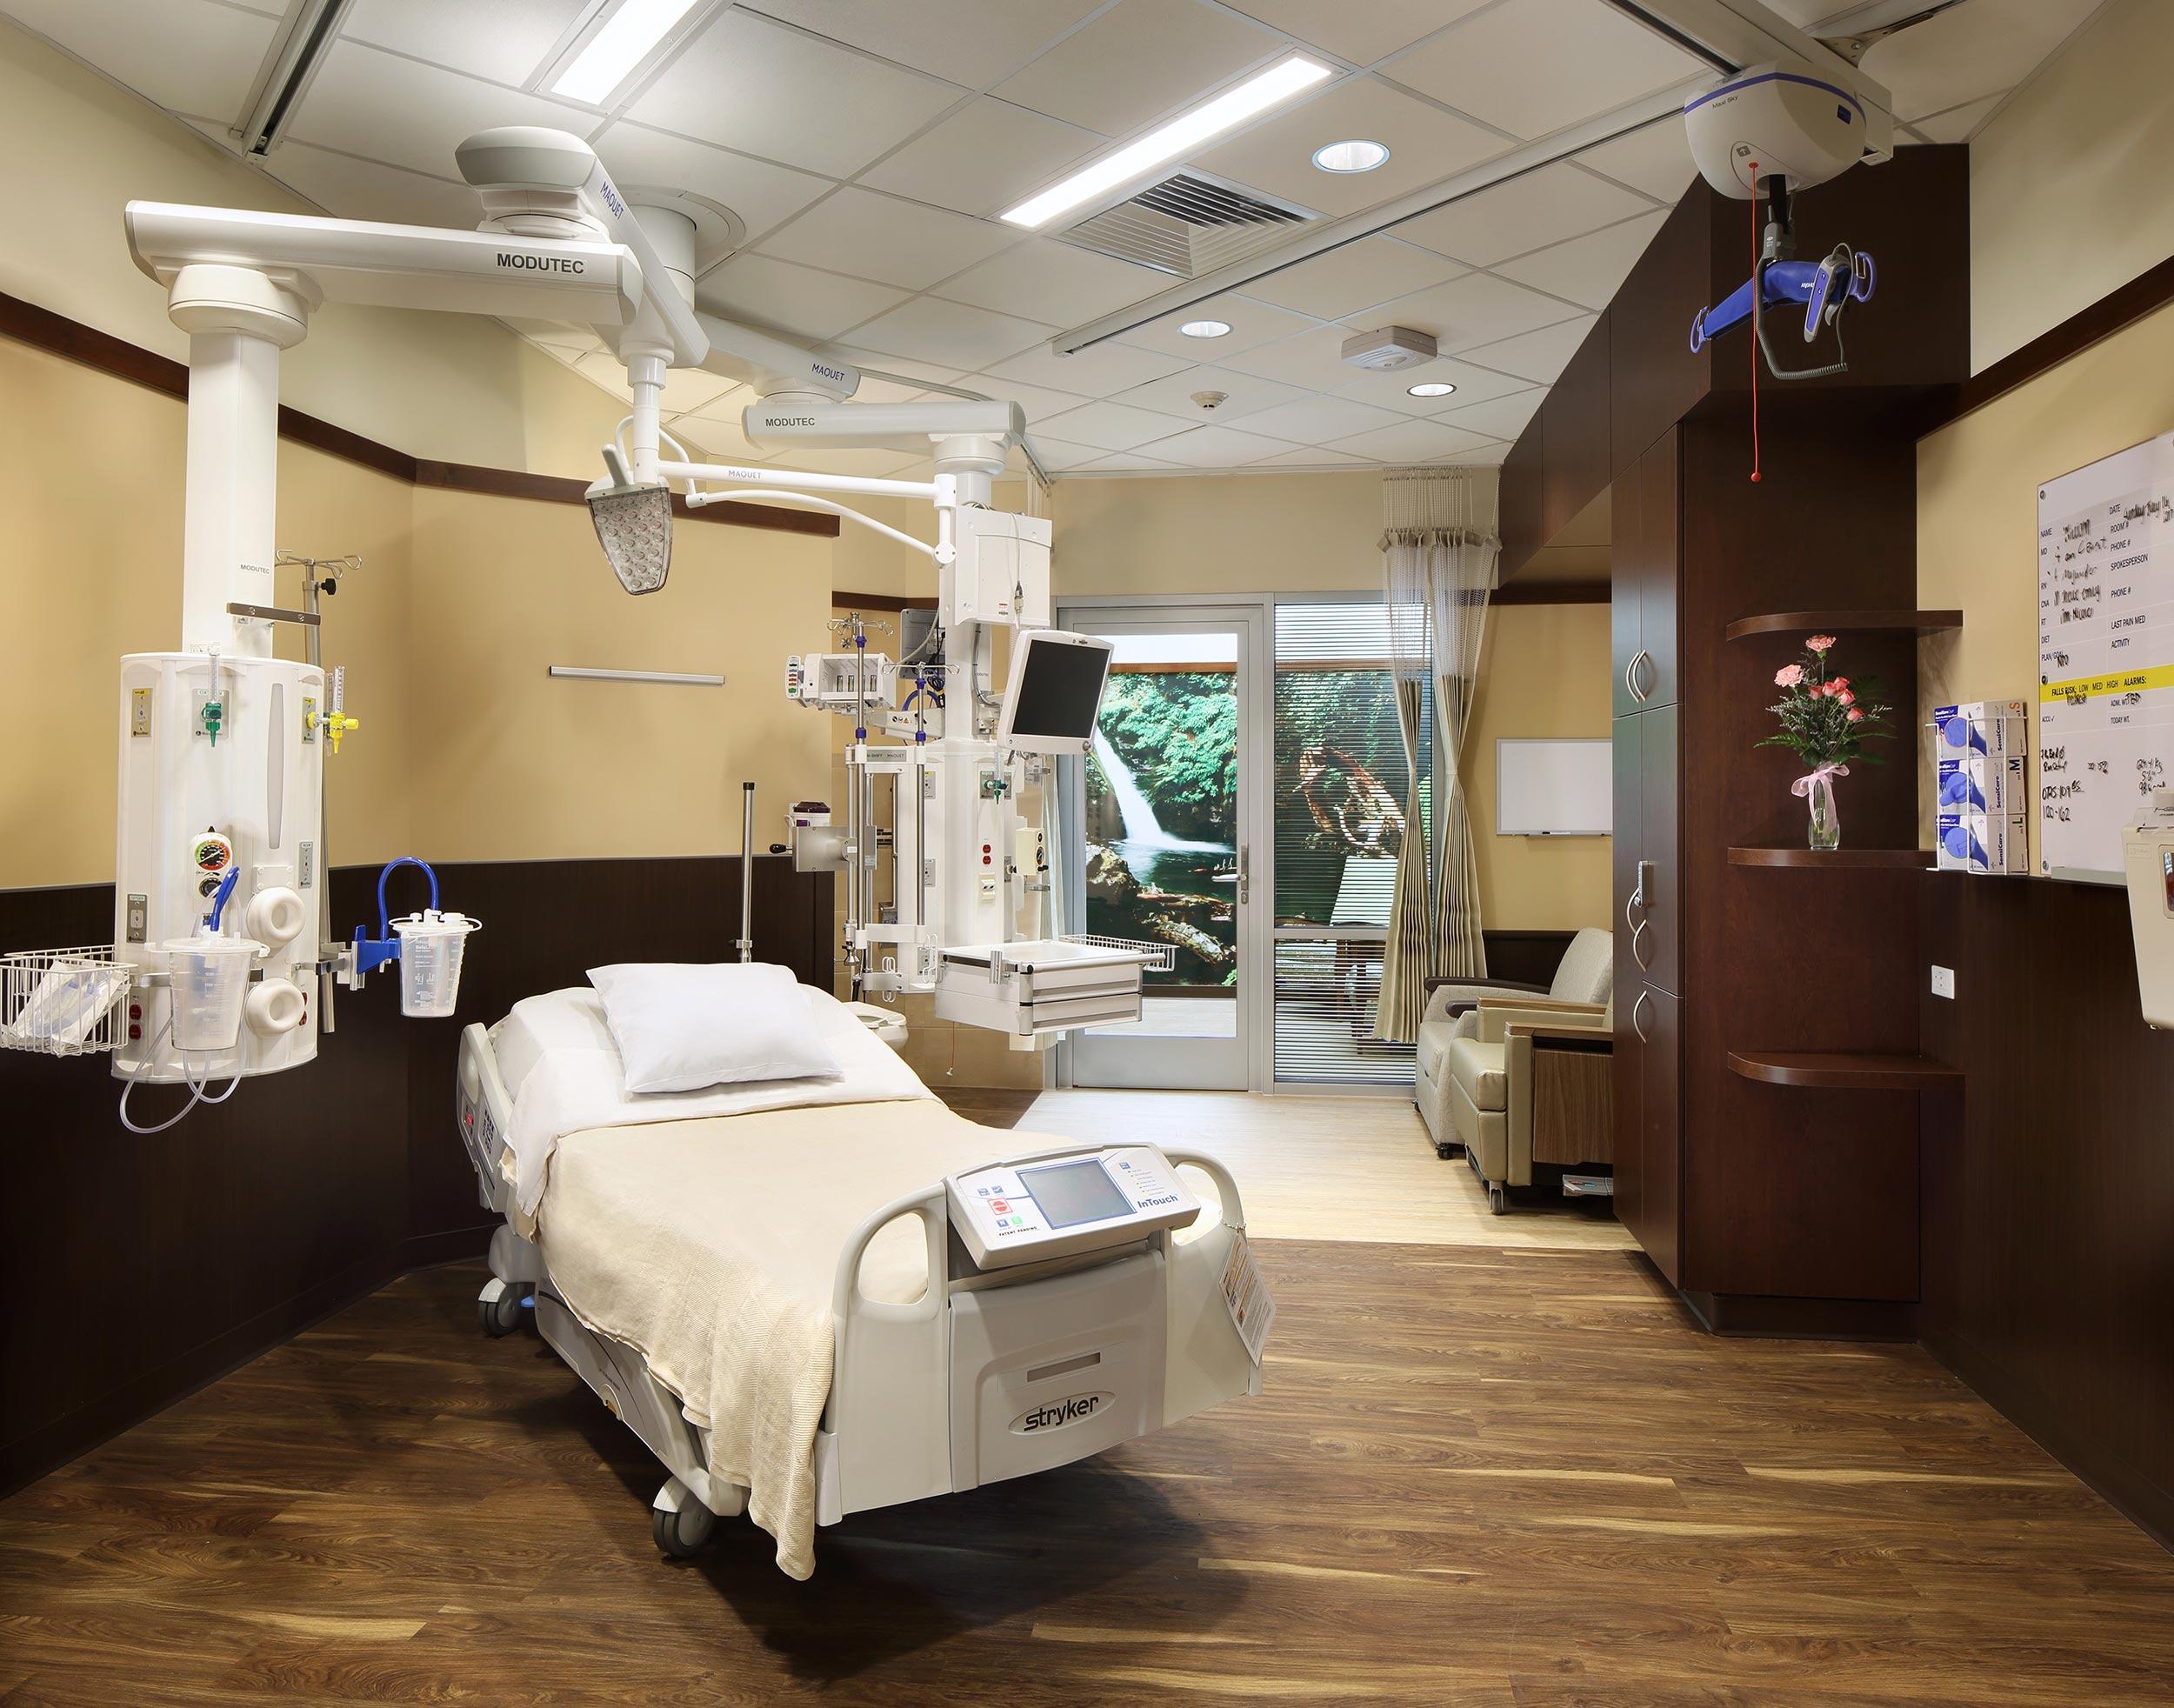 Hospital interior photographer